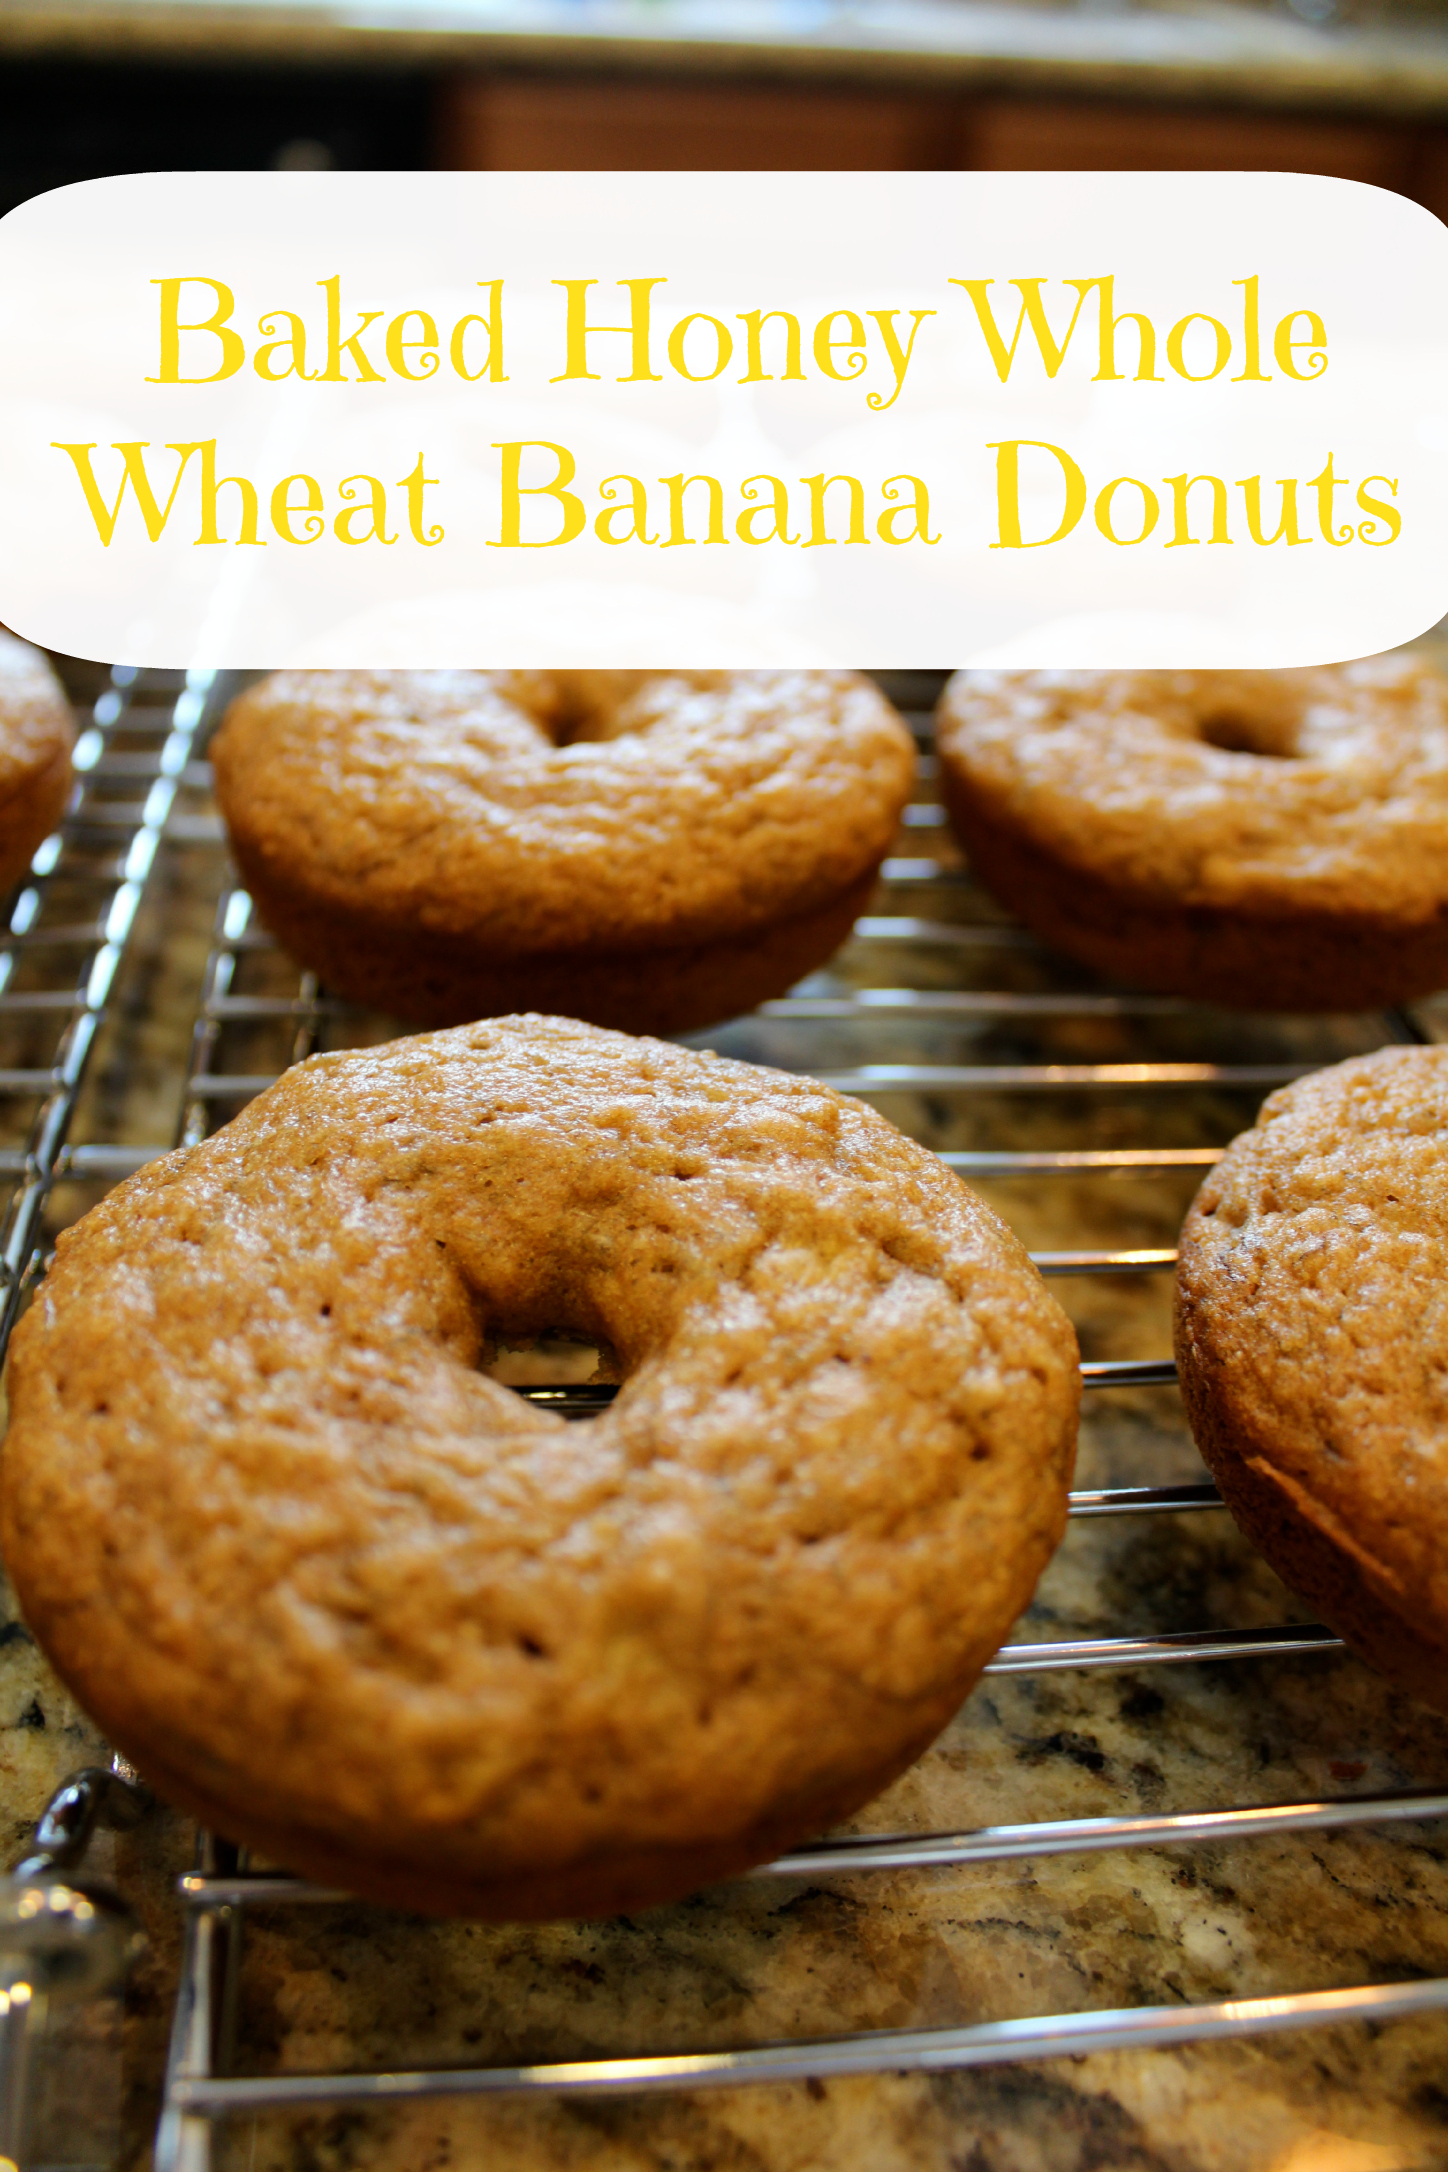 ... doughnuts gingerbread doughnuts whole wheat banana nut doughnuts